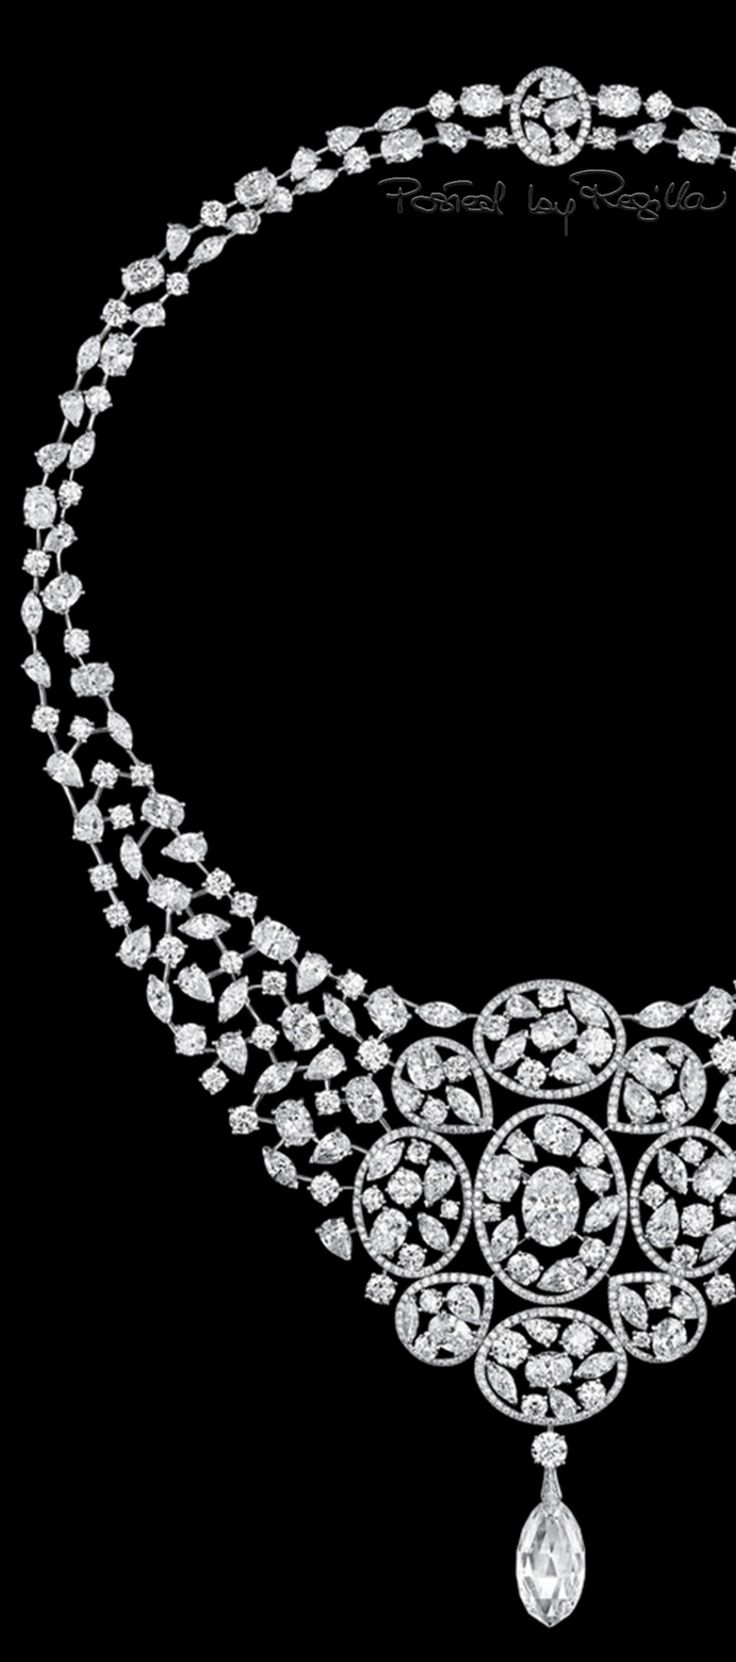 Regilla ⚜ Chanel - Les Talismans de Chanel Haute Joaillerie Fall Winter 2015